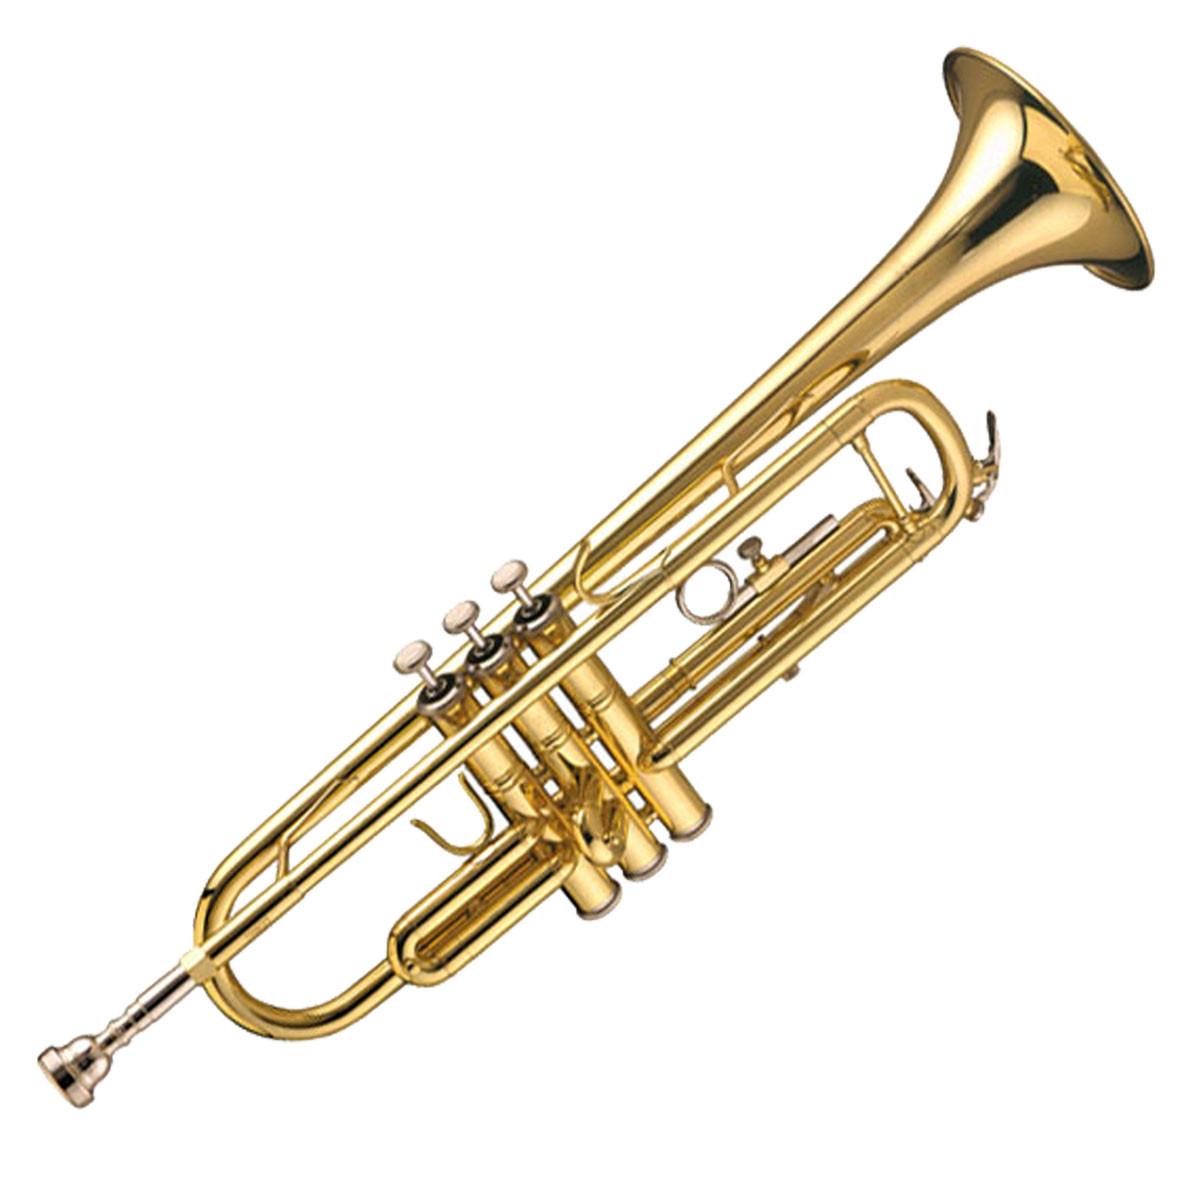 Bach / TR-600GL バック B♭トランペット エントリーモデル ラッカー仕上げ【横浜店】【5年保証】